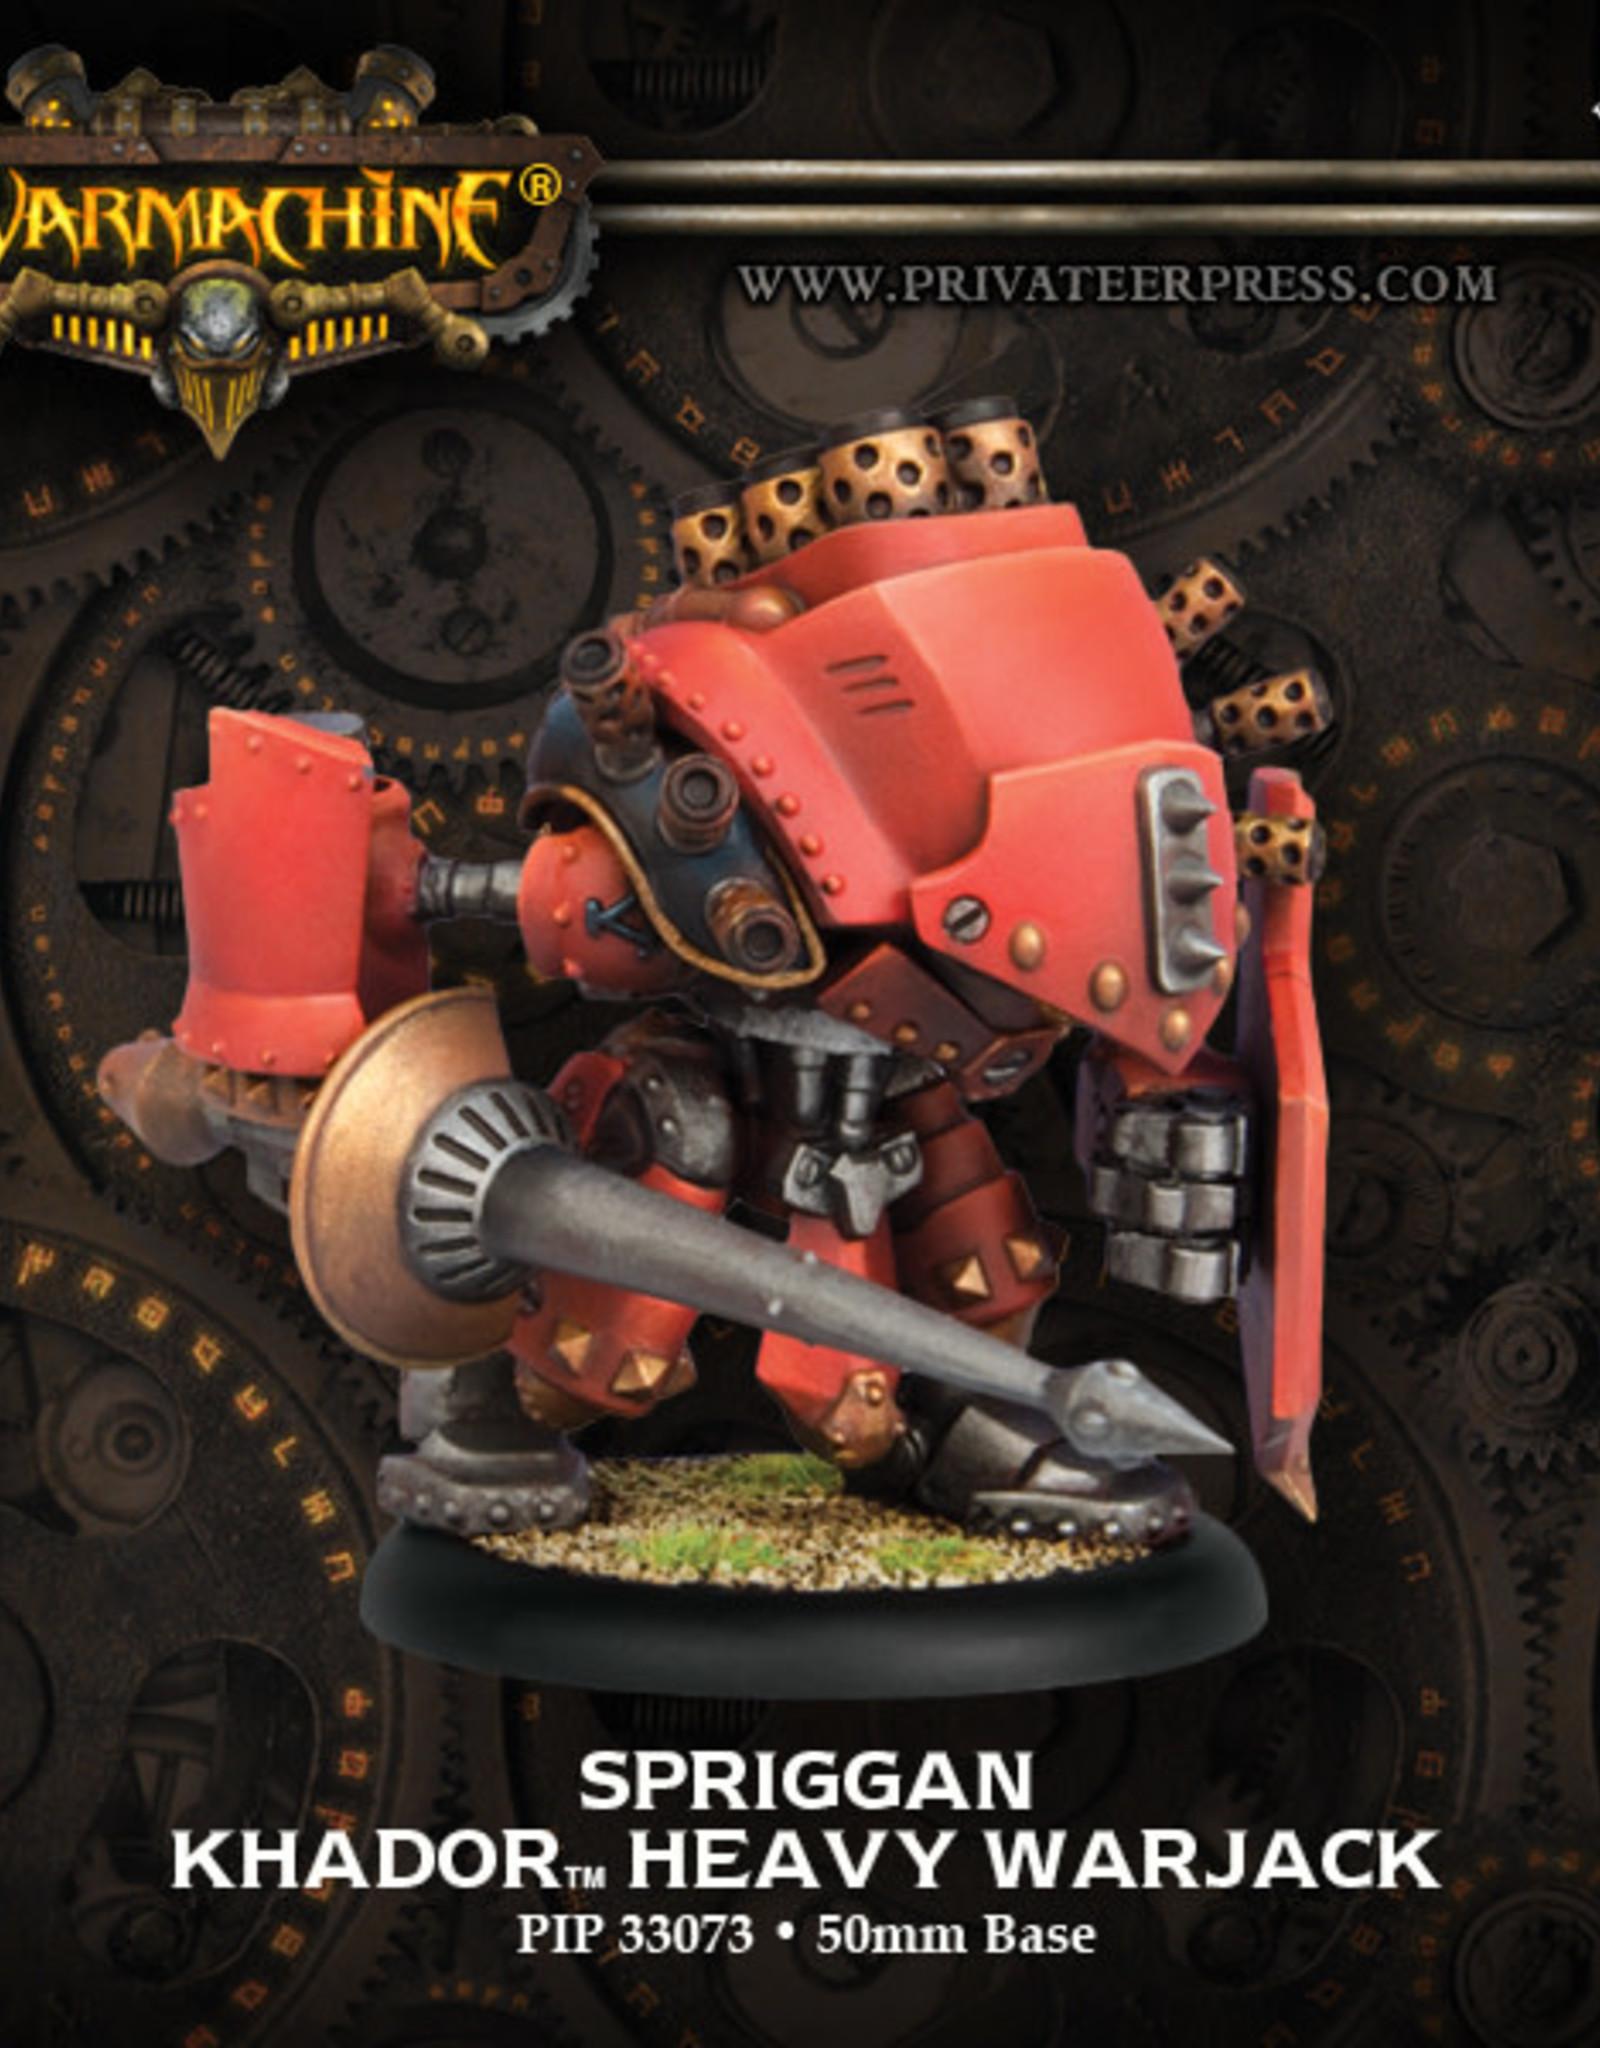 Warmachine Khador - Demolisher/Devastator/Spriggan Kit